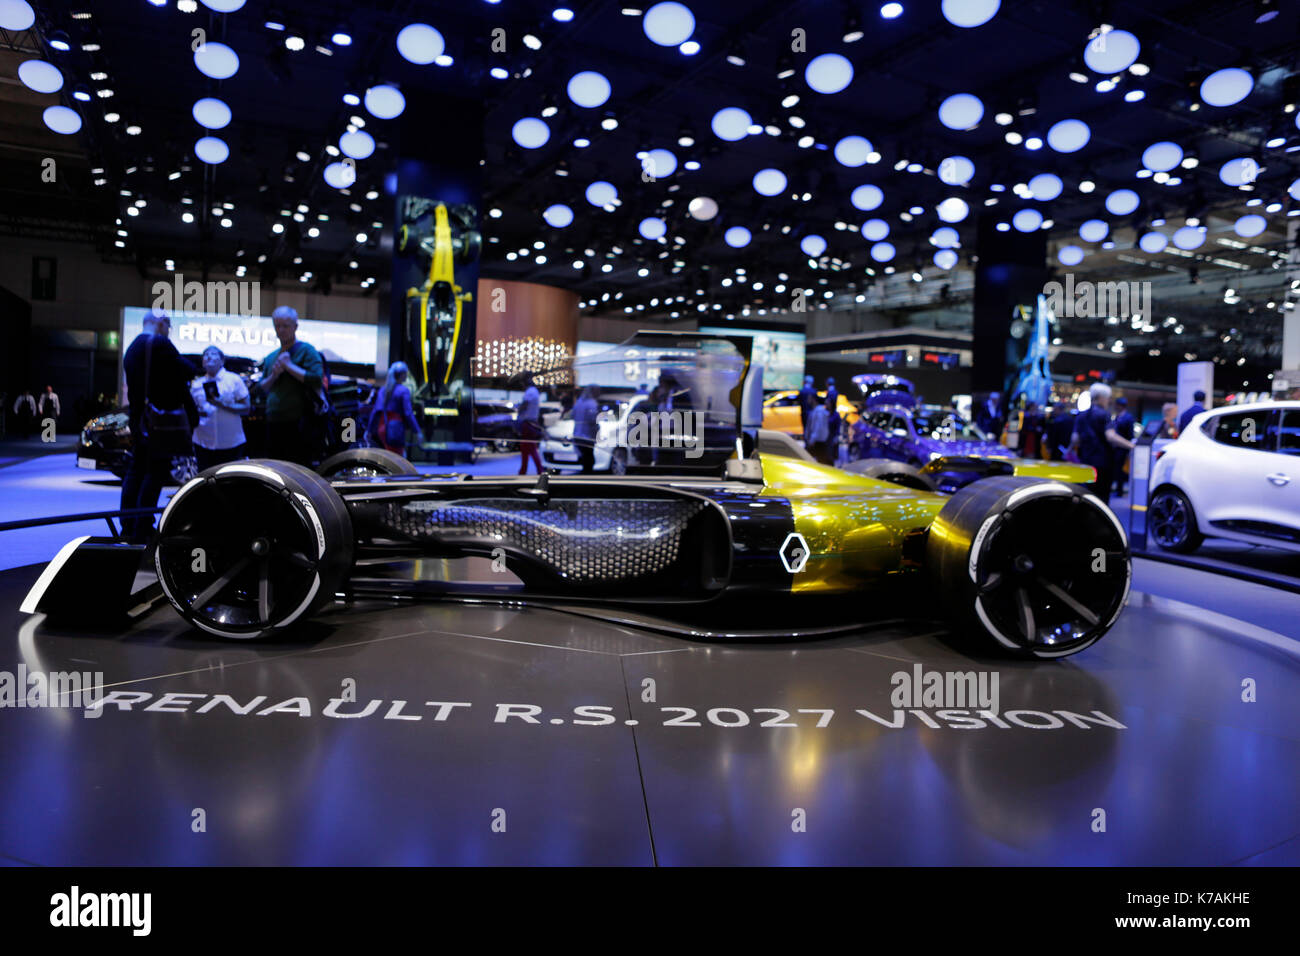 Renault r.s 2027 vision salon de shanghai 2017 1:43 auto stradali scala